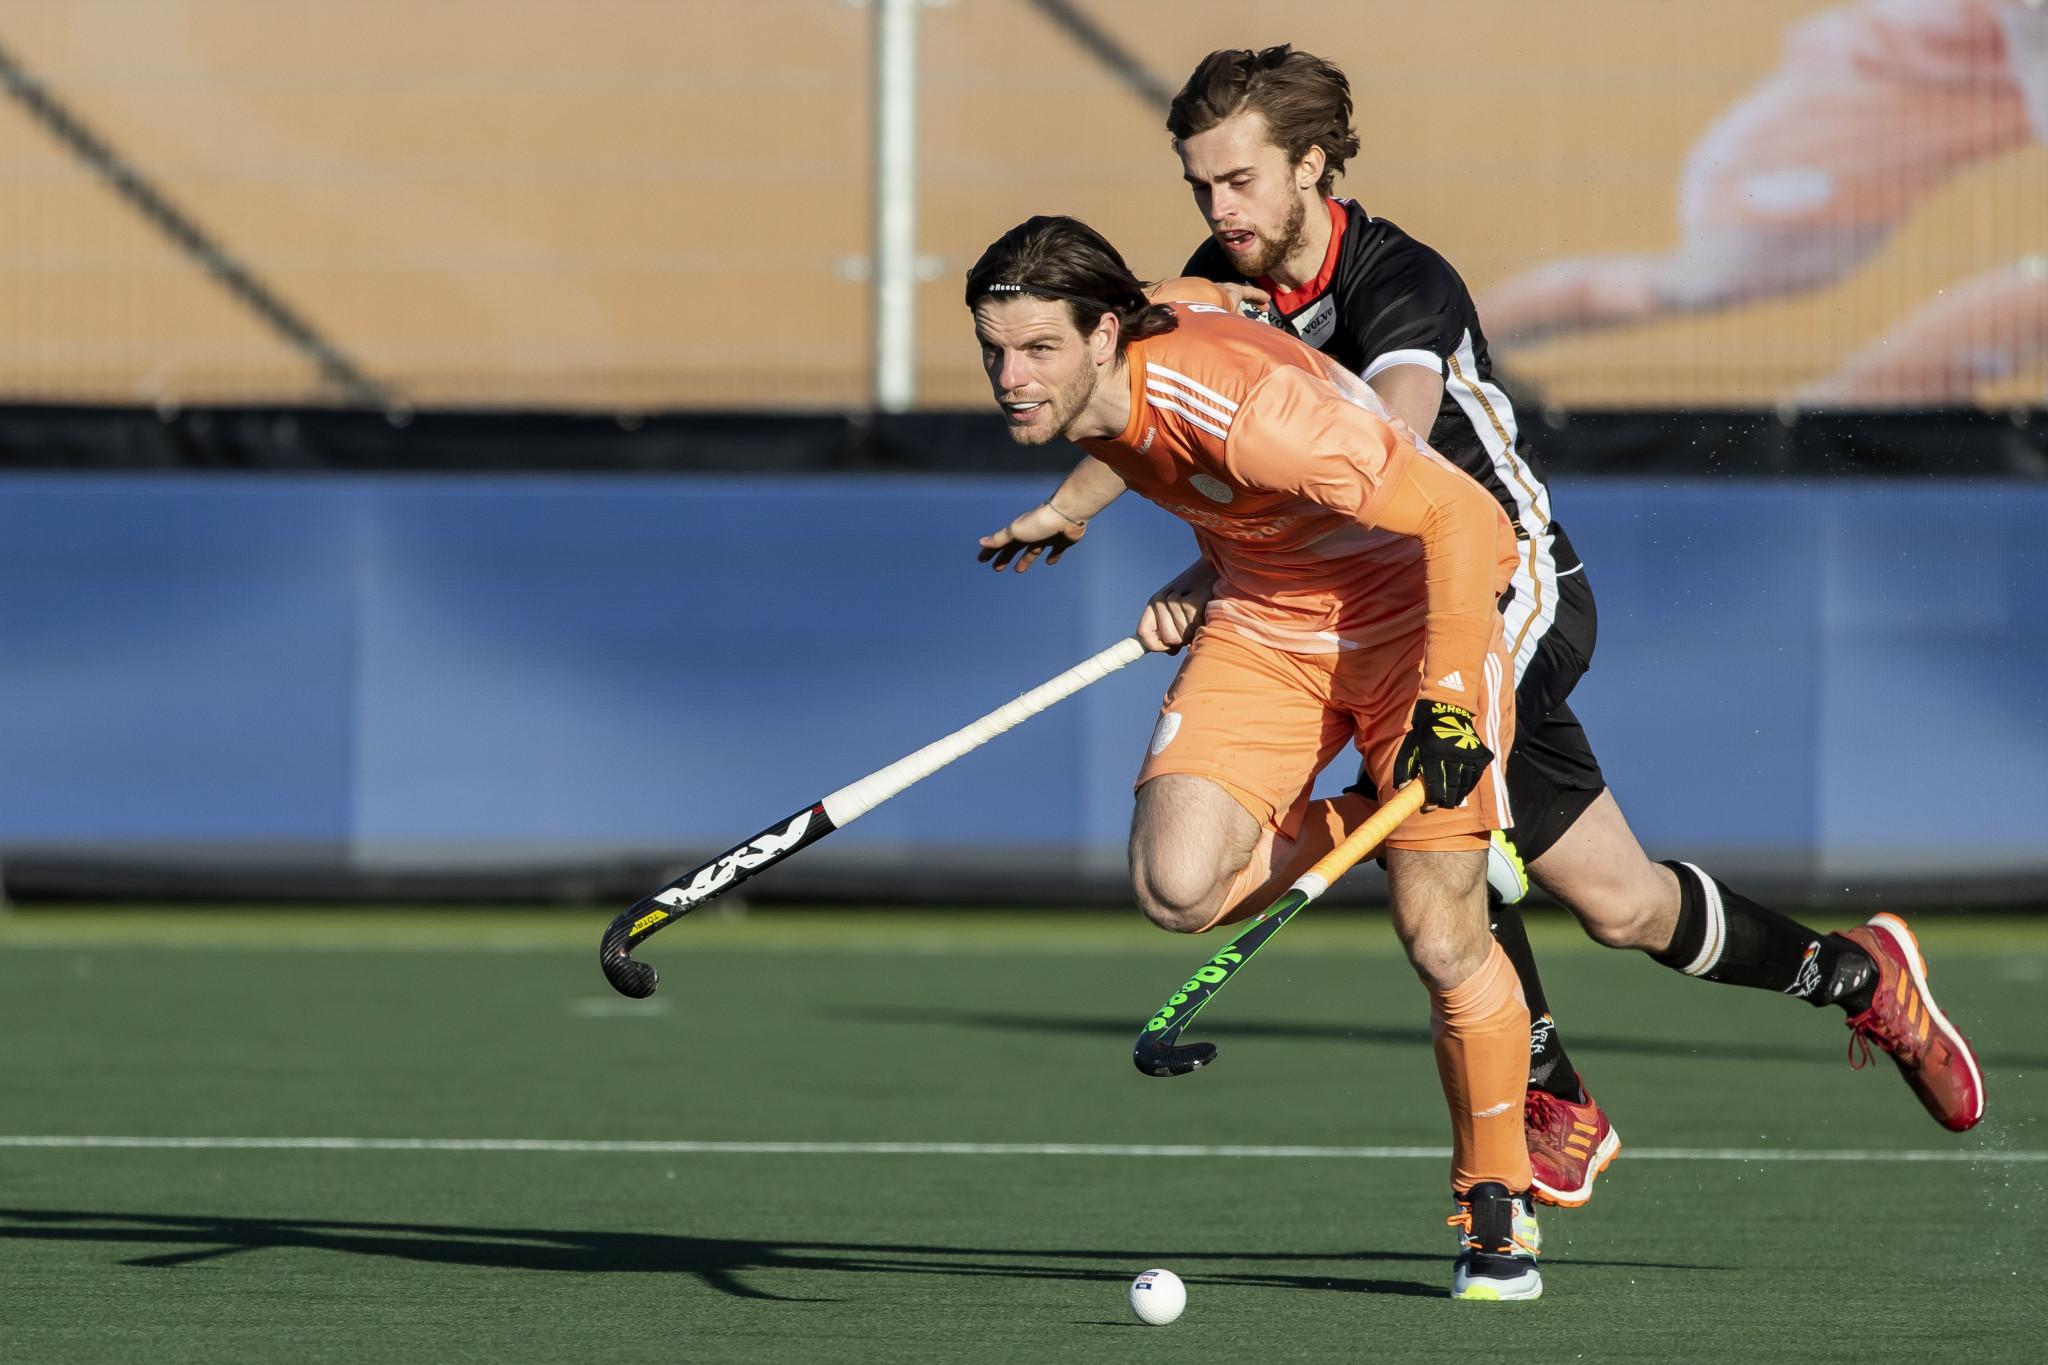 Dutch women and German men claim second FIH Hockey Pro League wins